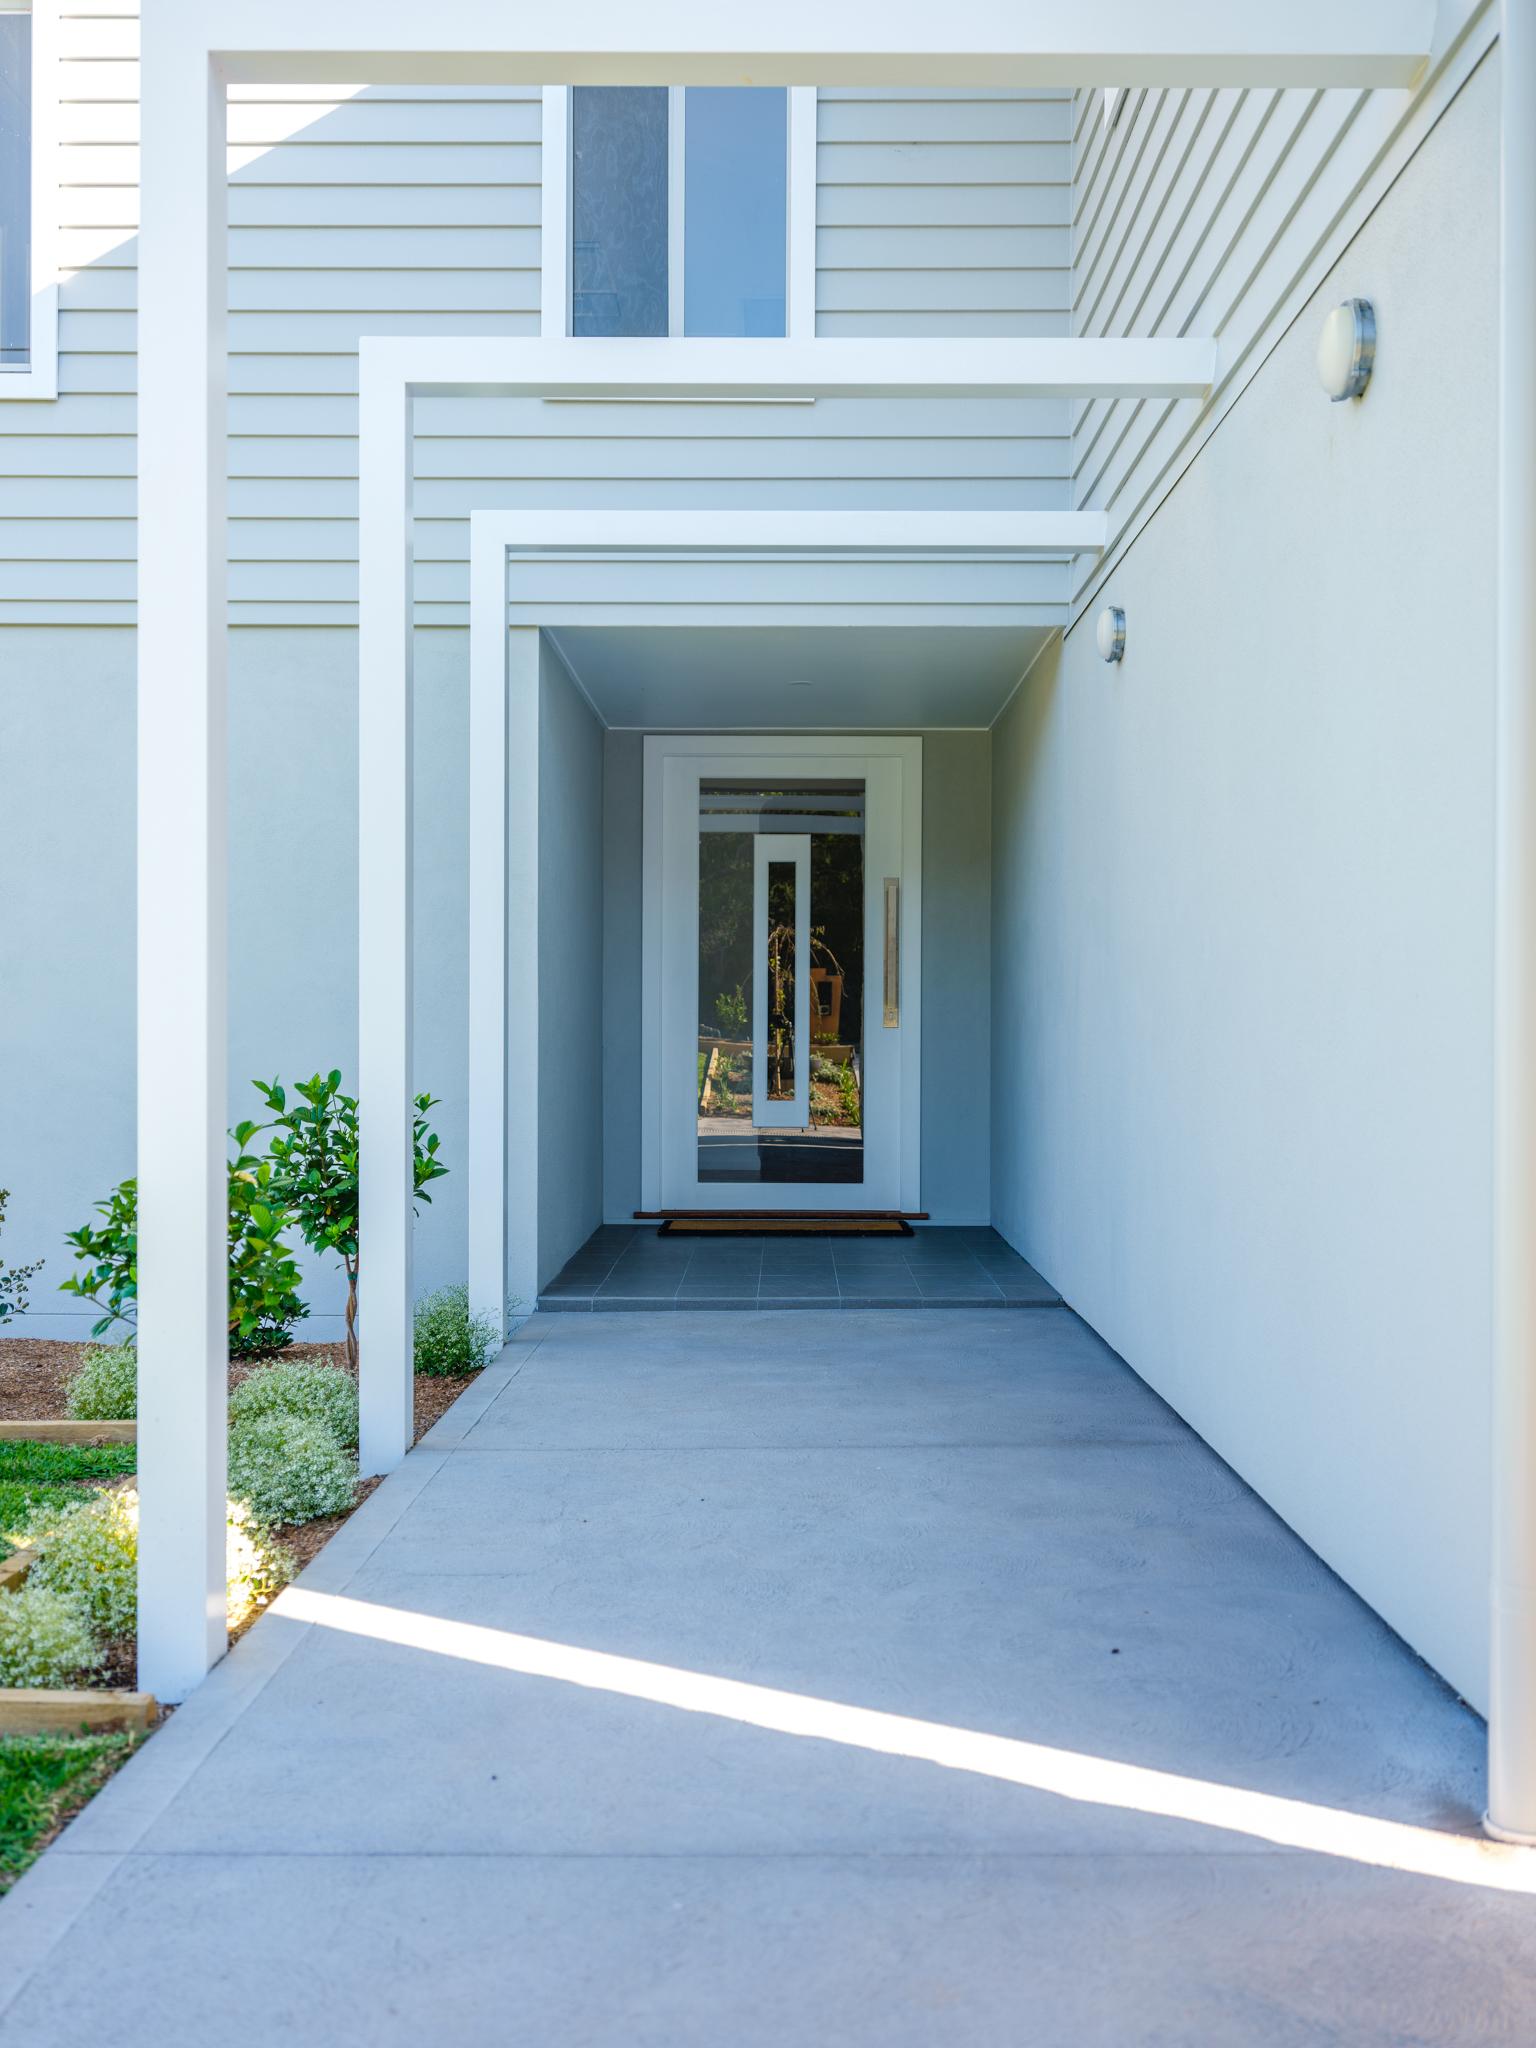 Karchitect sydney central coast architecture residentaial design 05.jpg